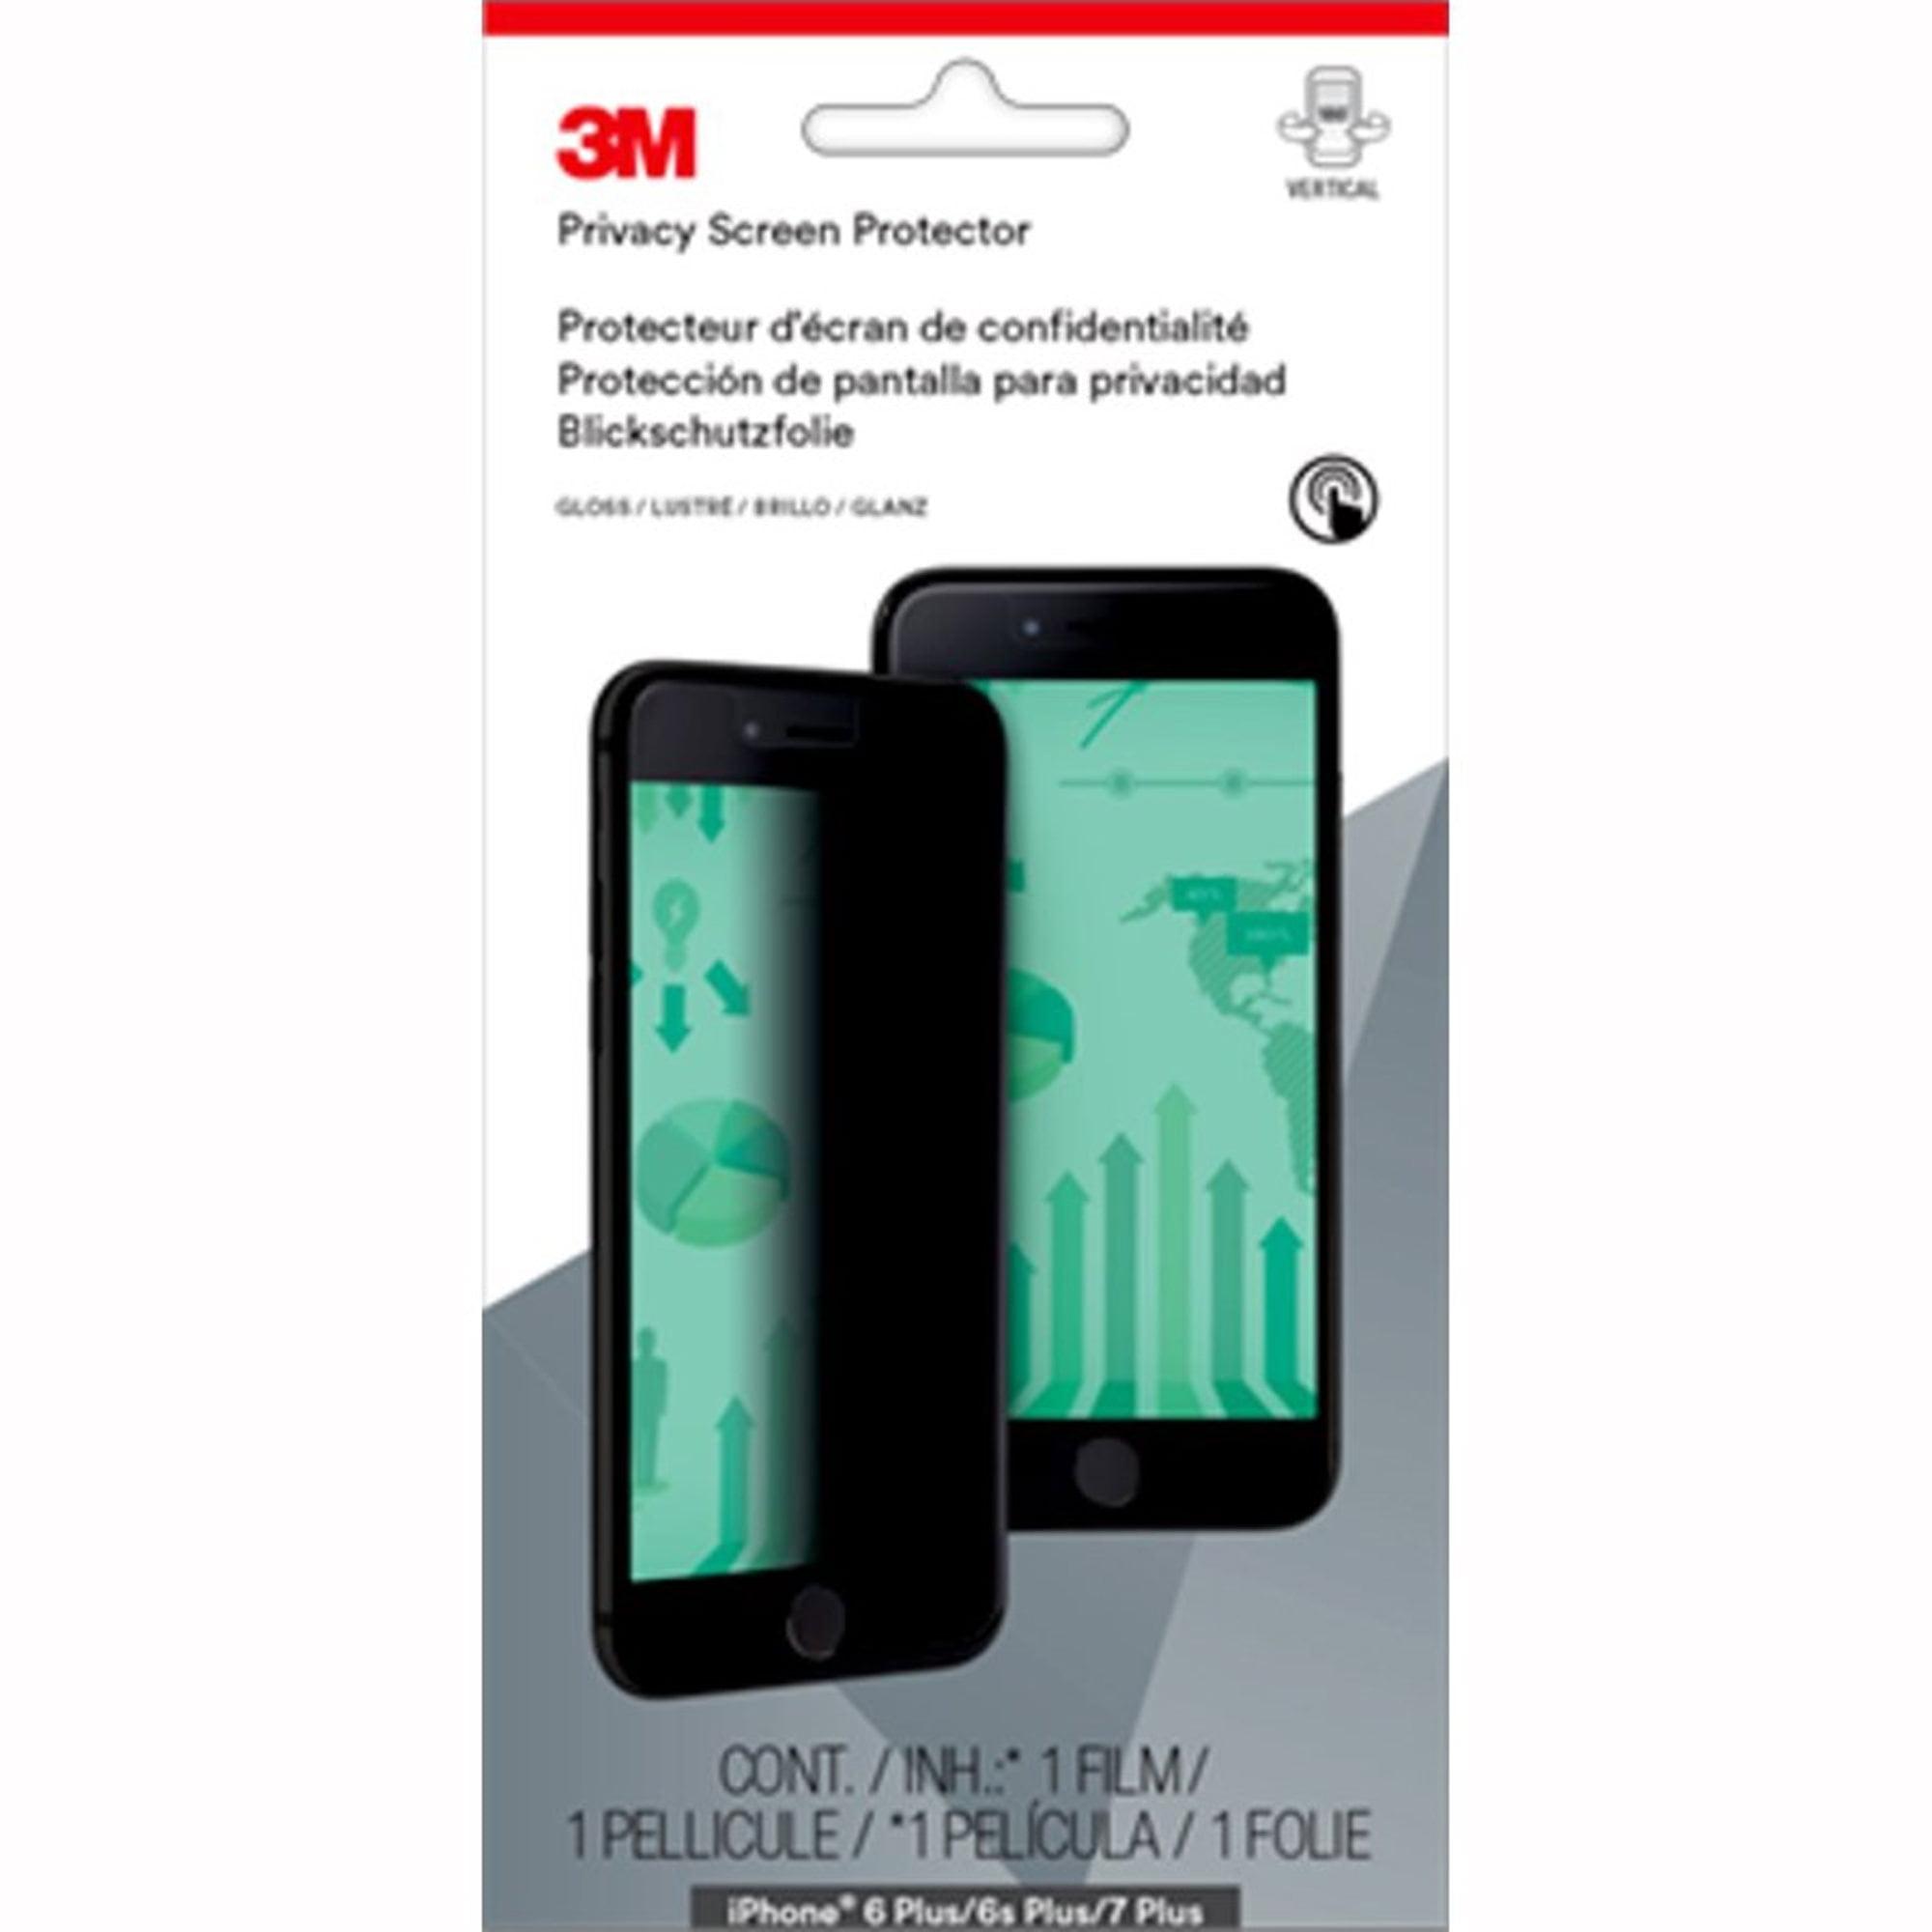 3M Privacy Screen Protector for Apple iPhone® 6 Plus/6SPlus/7Plus/8 Plus